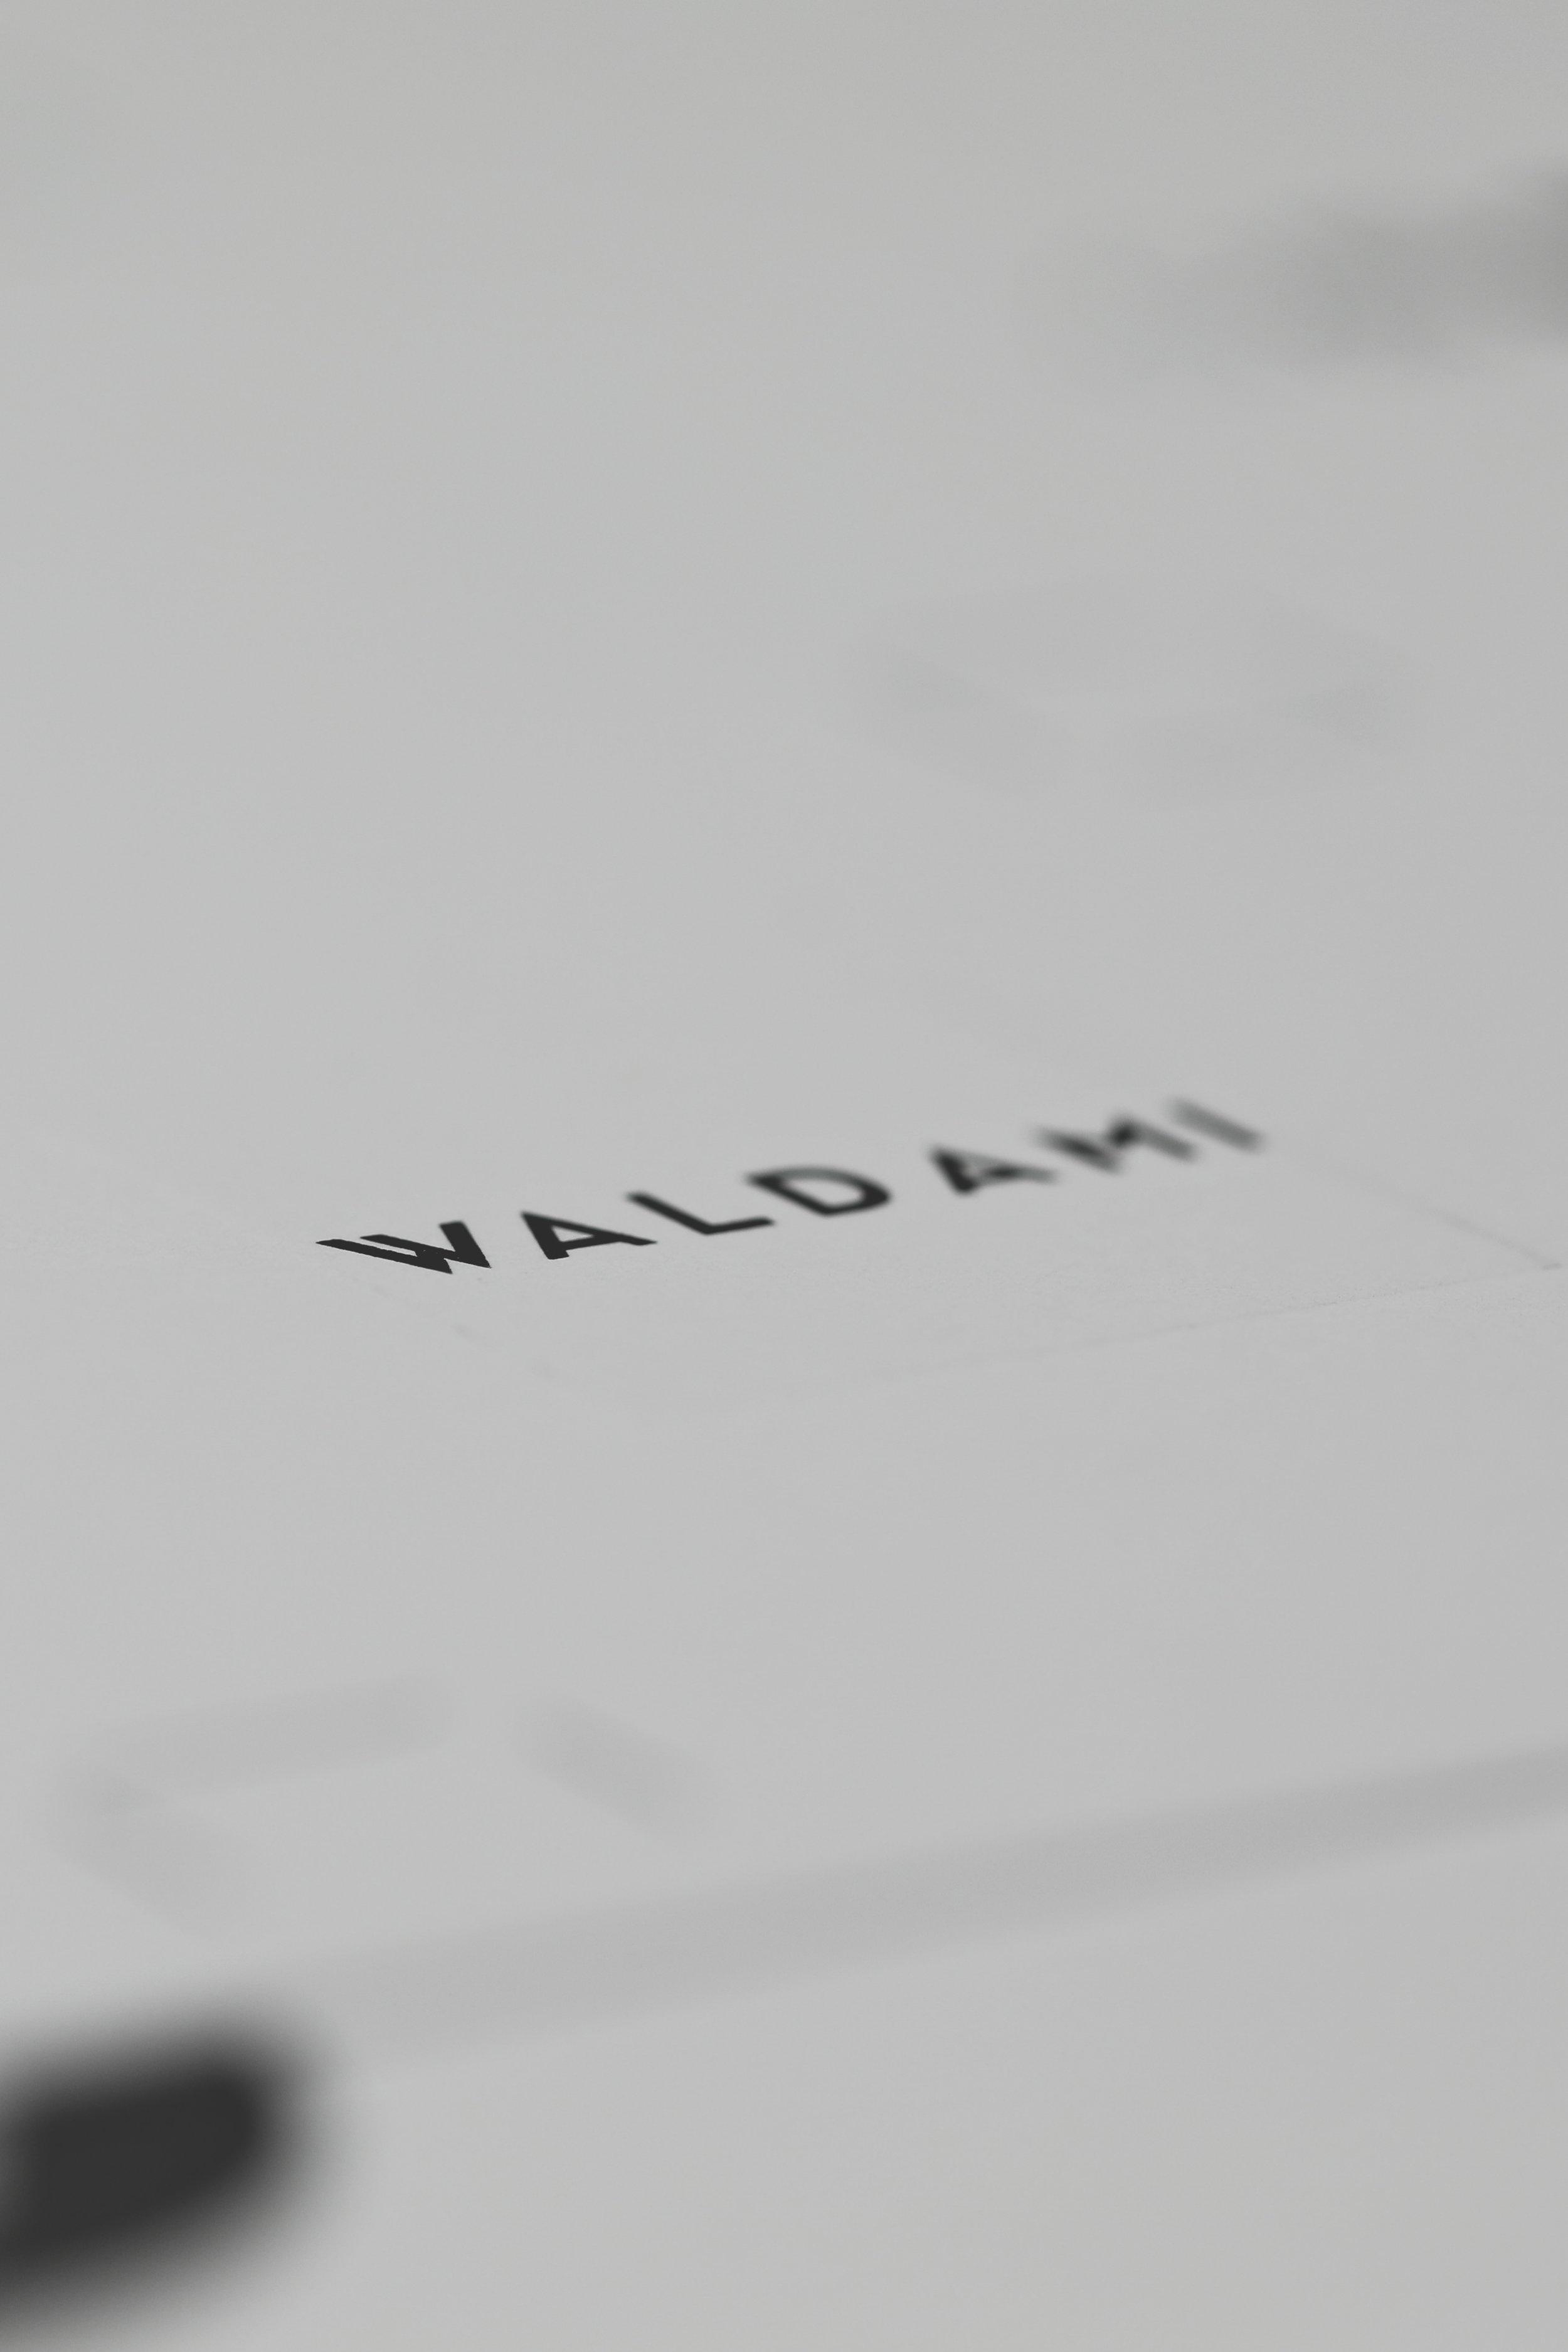 WALDAMI, a card game